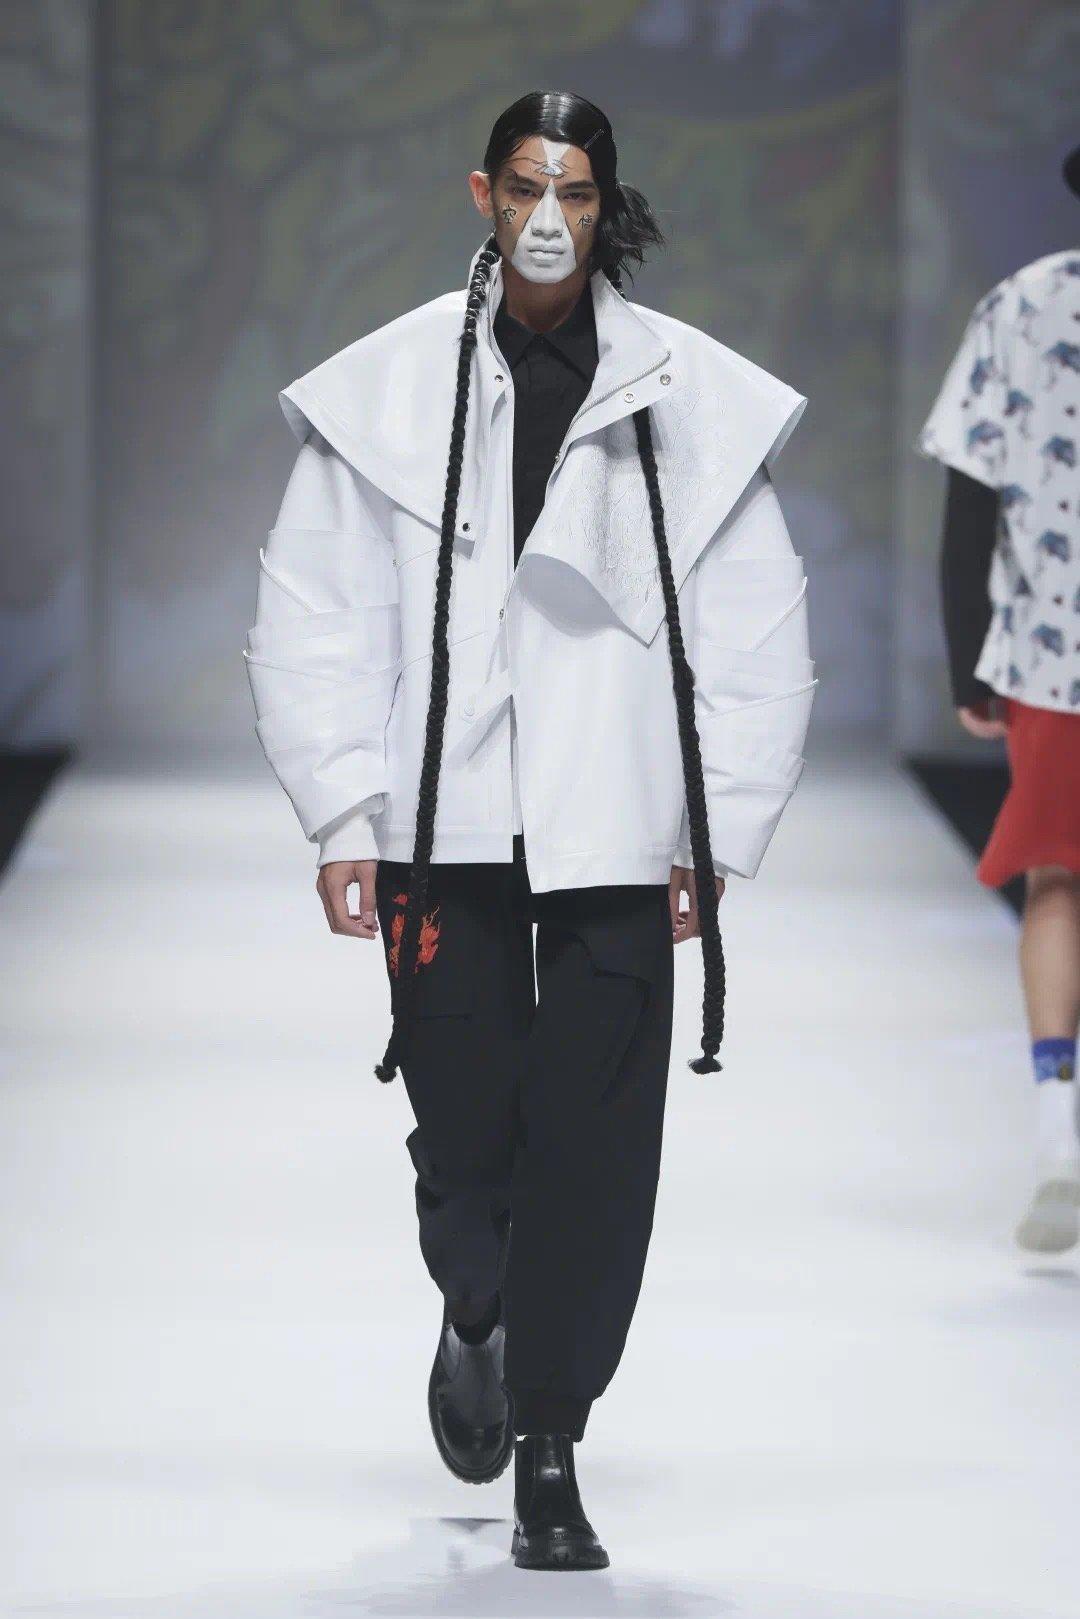 WOOKONG以中国传统文化为基石,大胆吸收国际流行趋势和时尚元素